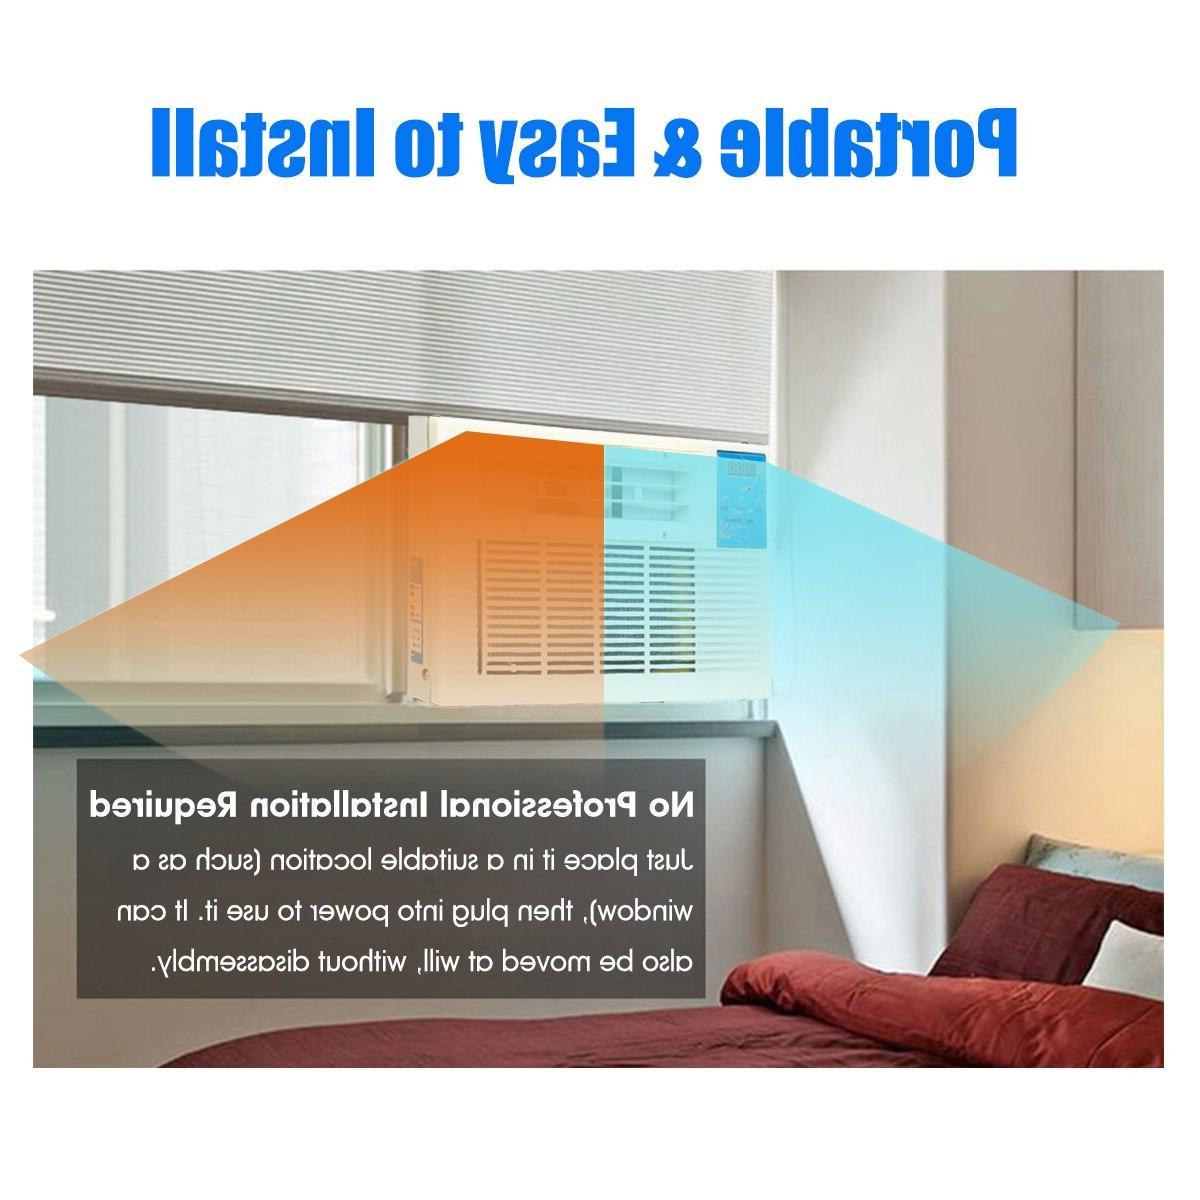 Newest 3072 BTU Portable <font><b>Heater</b></font> <font><b>Air</b></font> Window <font><b>Air</b></font> Heating Cold/Heat 220V